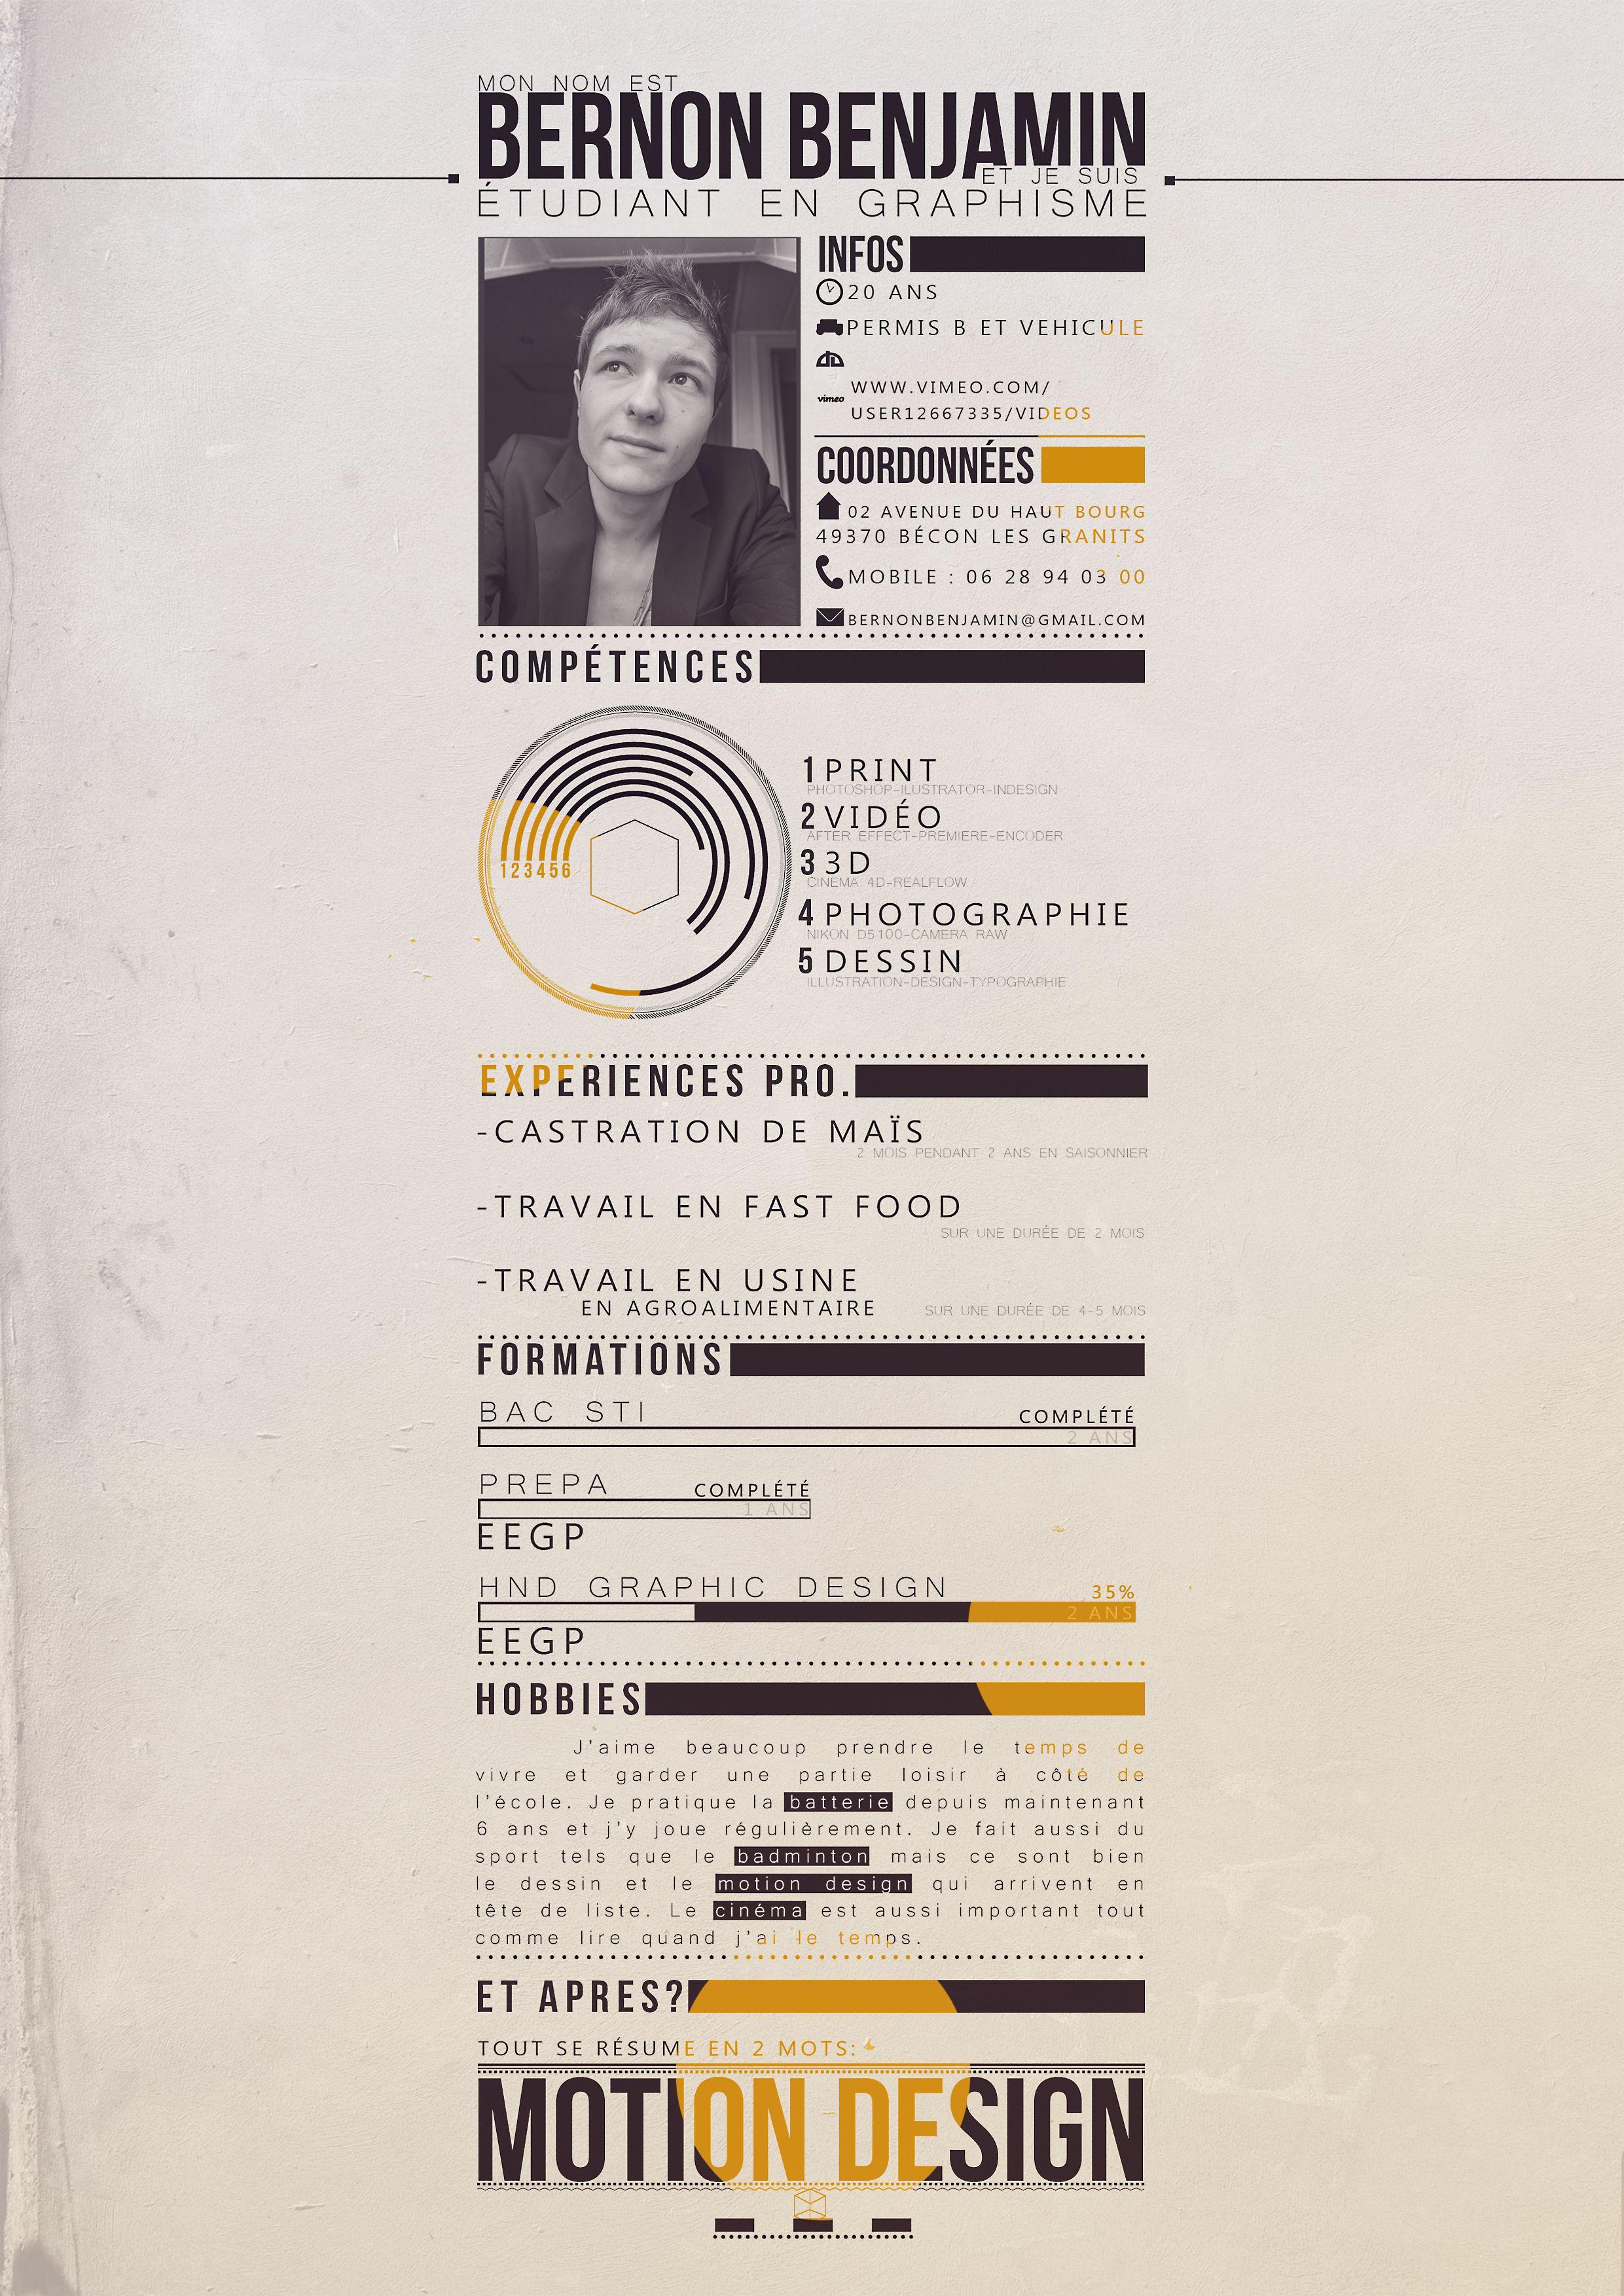 Cv Graphic Design Avec Images Idee Cv Graphisme Graphic